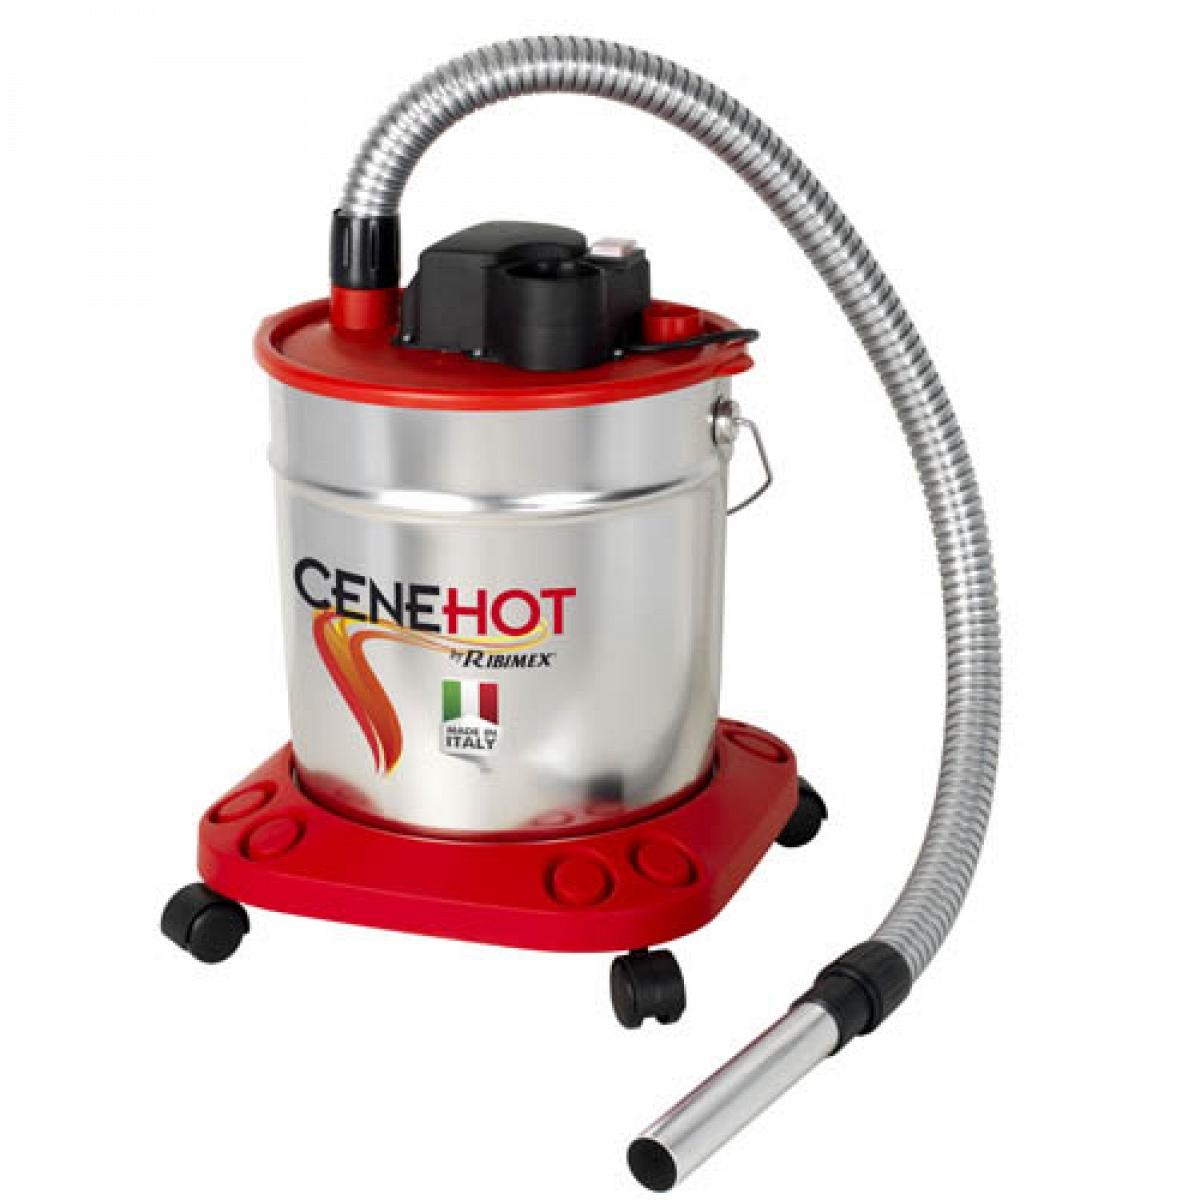 Ash Vacuum Cleaner Ribimex Mod Cenehot Ribimex Aspirators